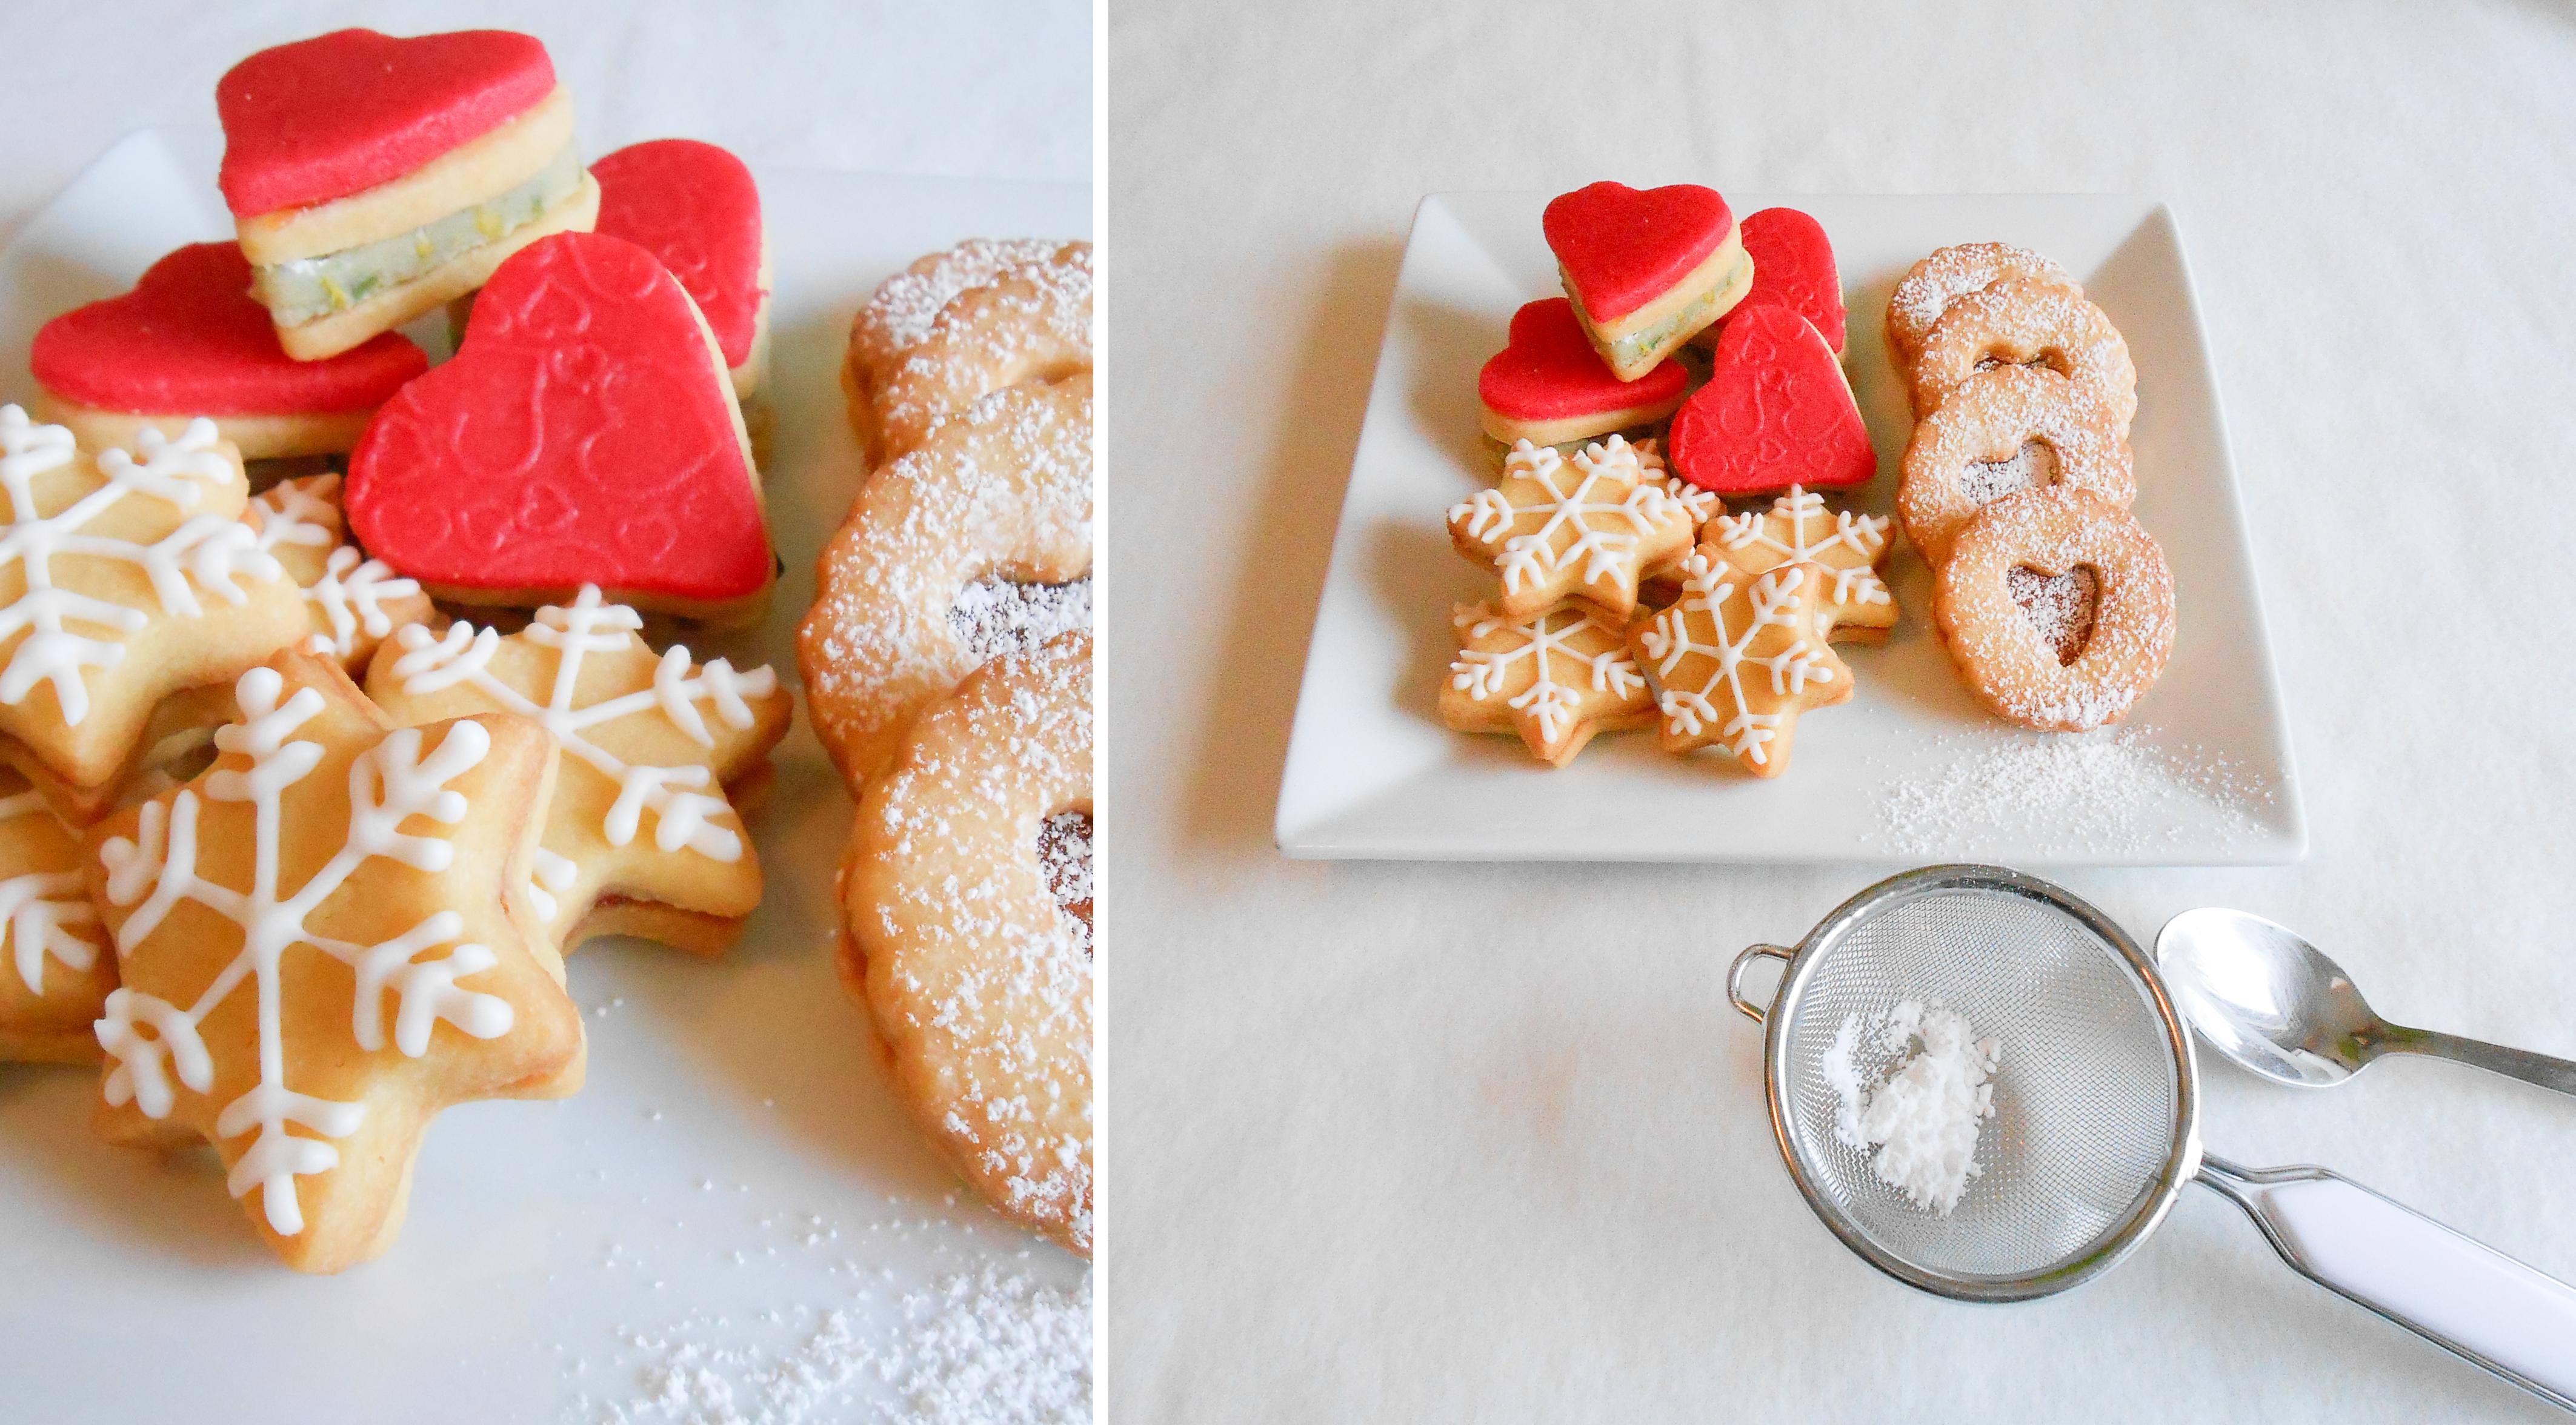 Kekse, Eiweißspritzglasur, Marzipan